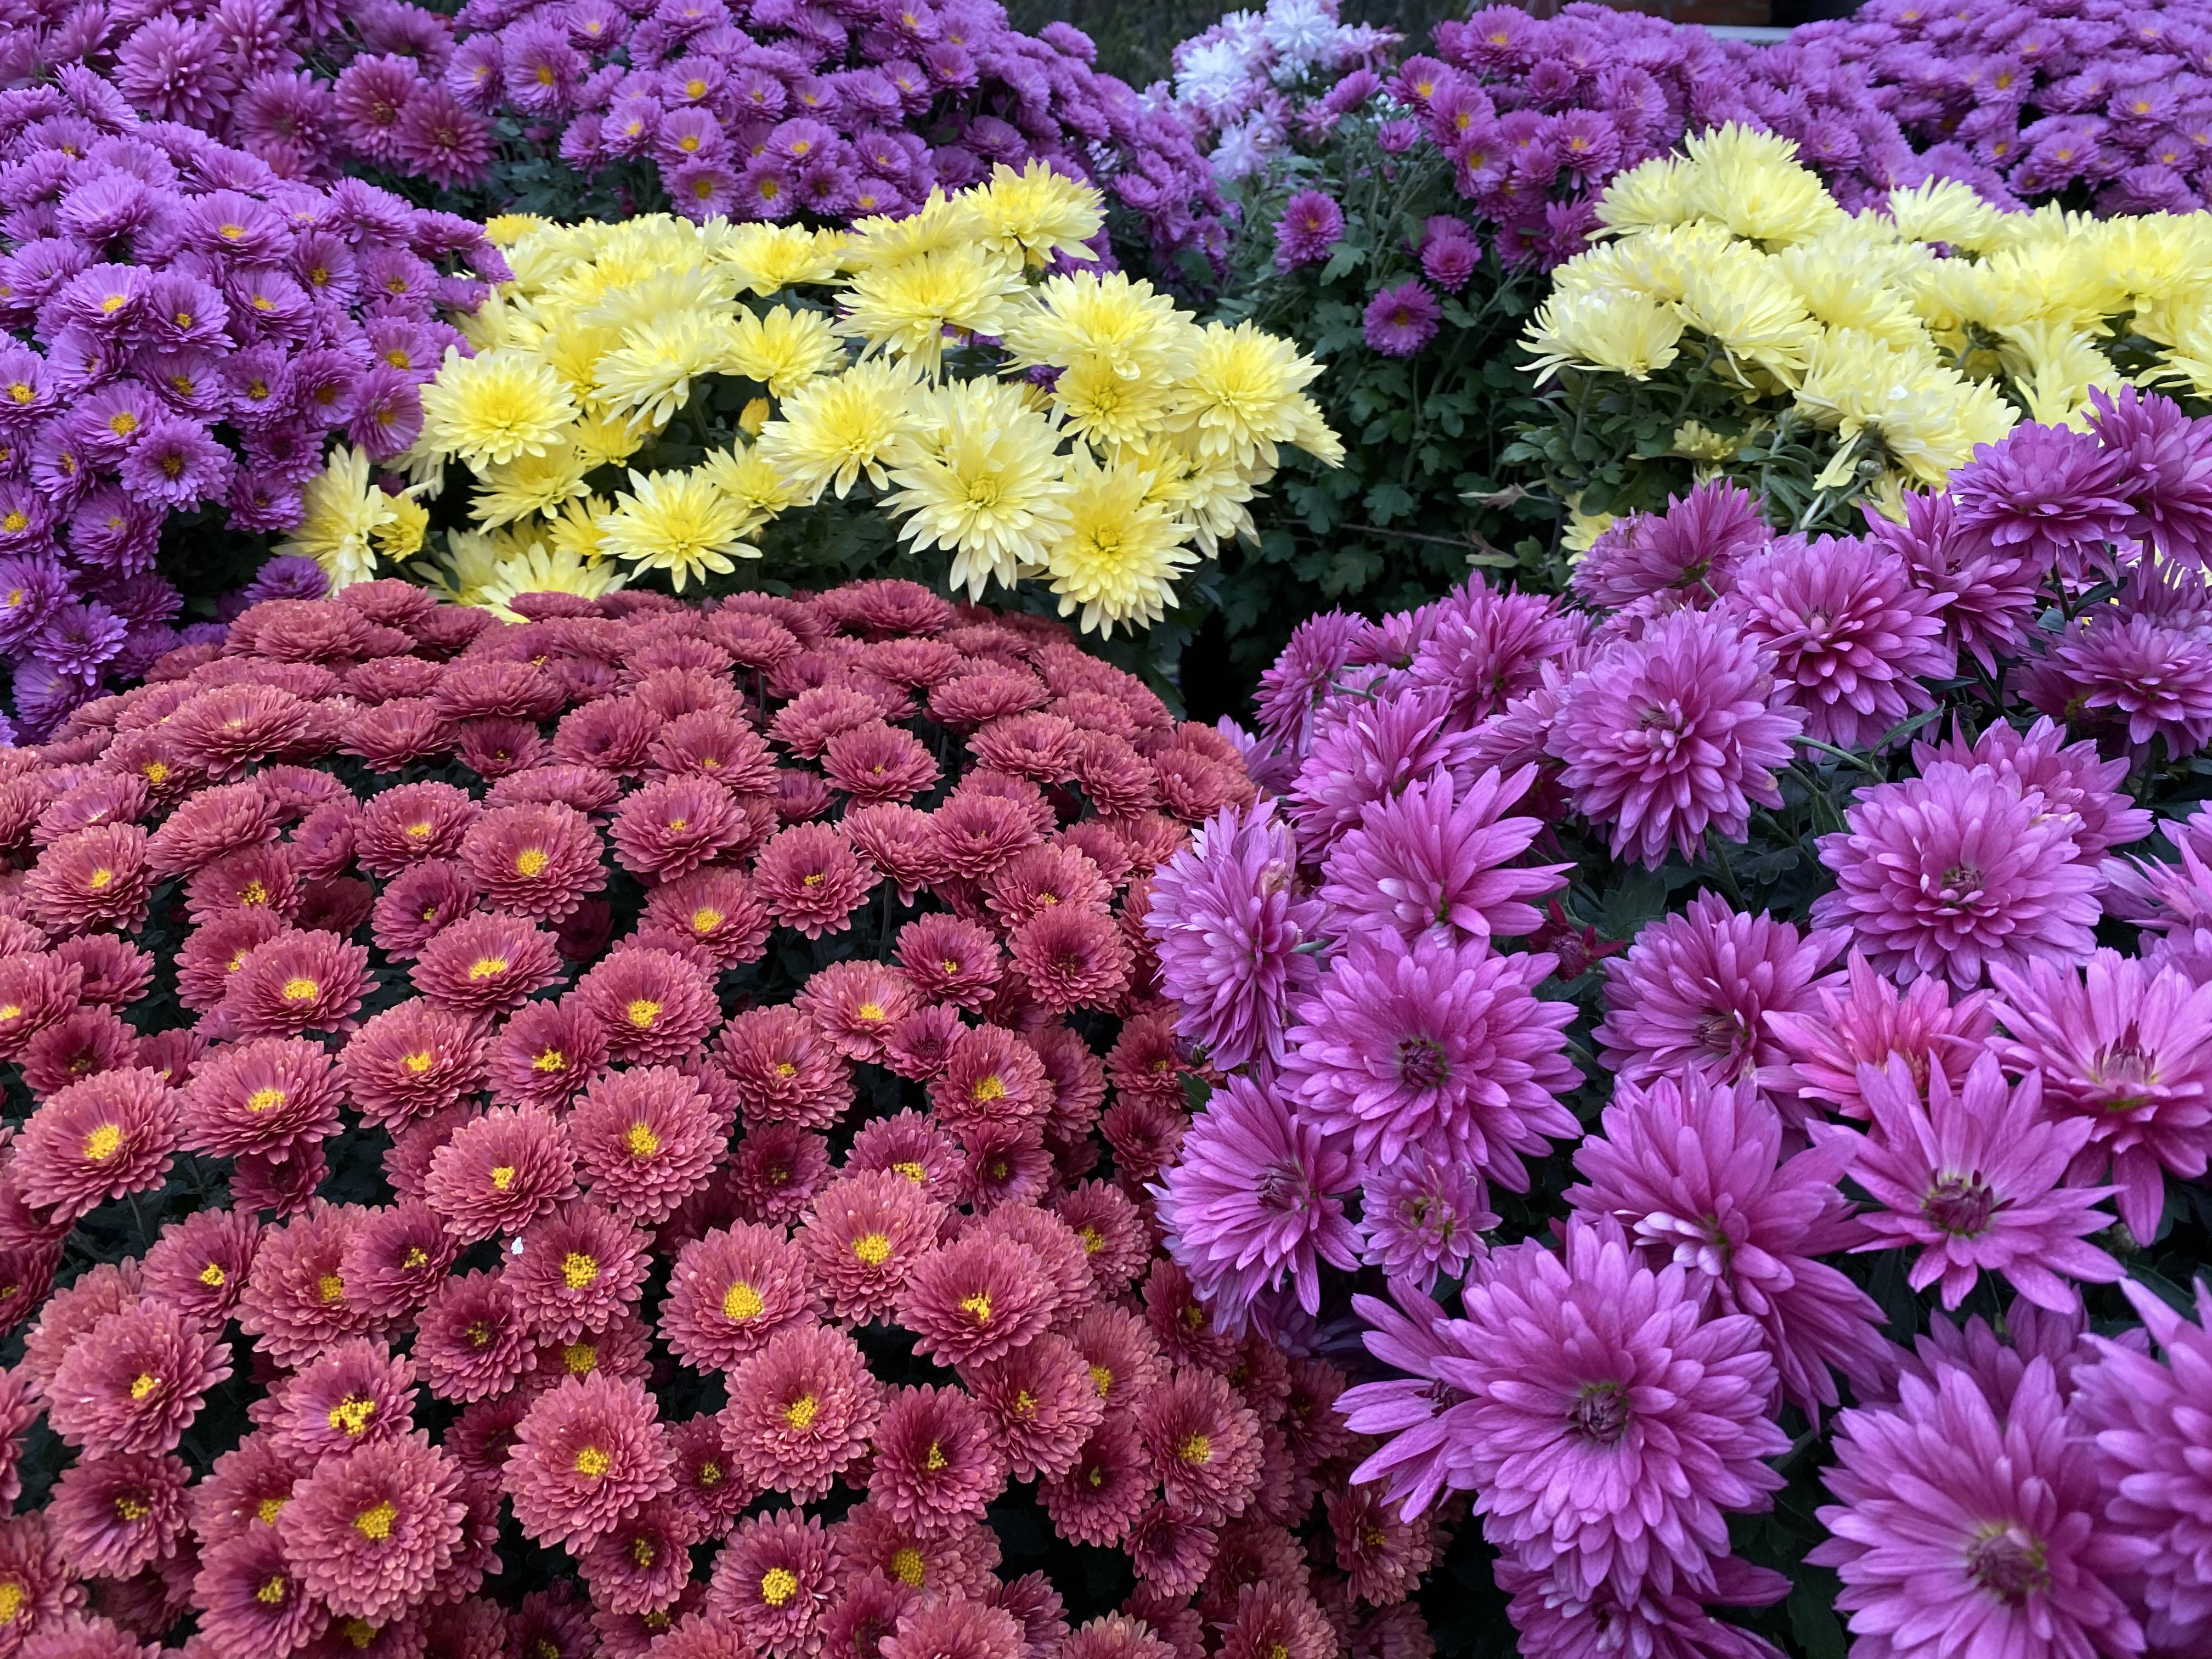 flores винница цветы